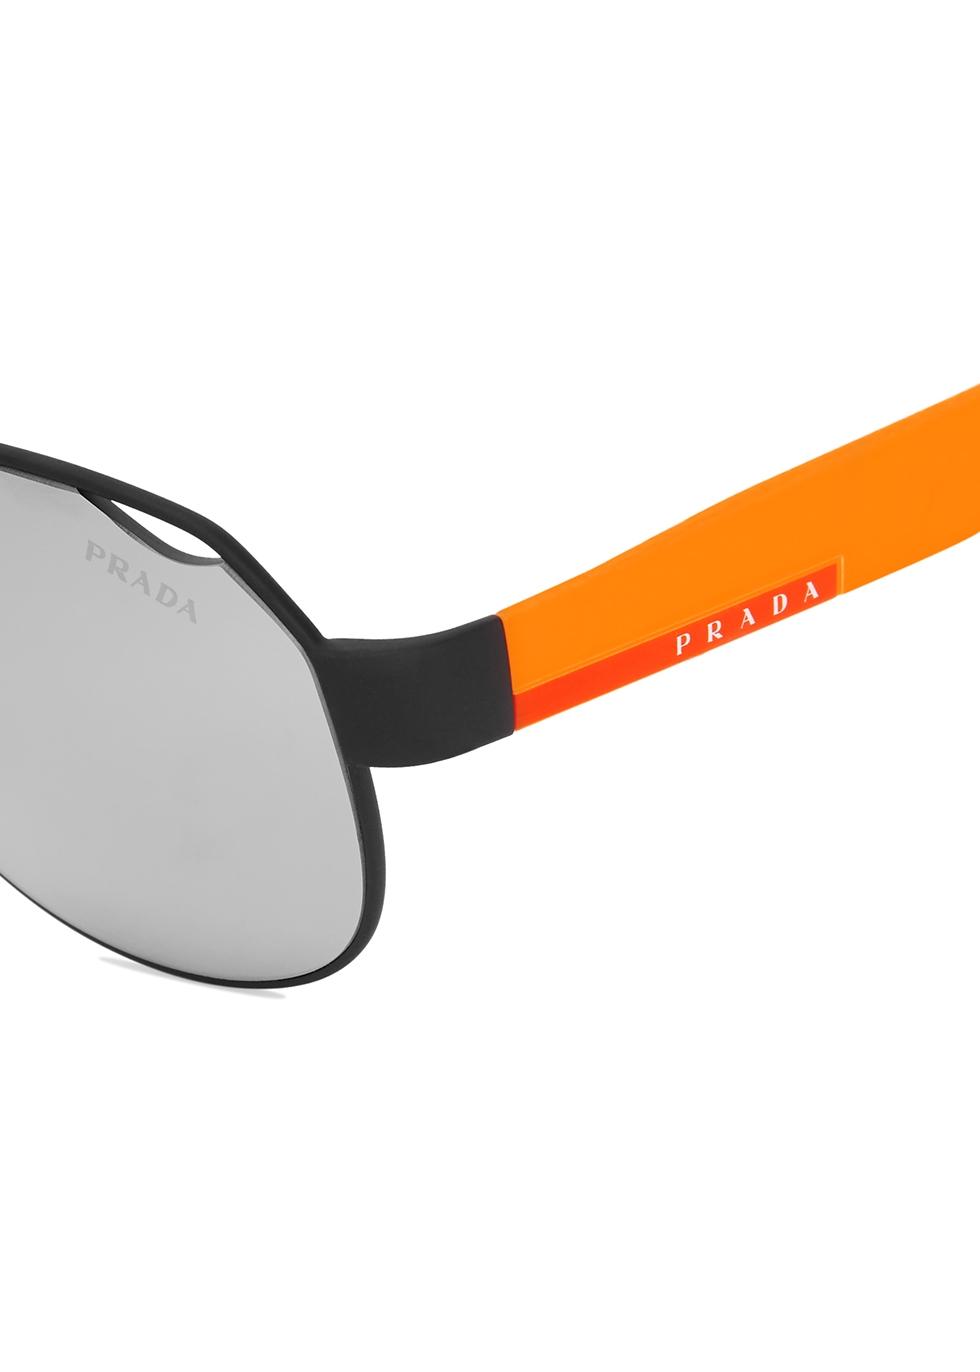 Black aviator style sunglasses - Prada Linea Rossa